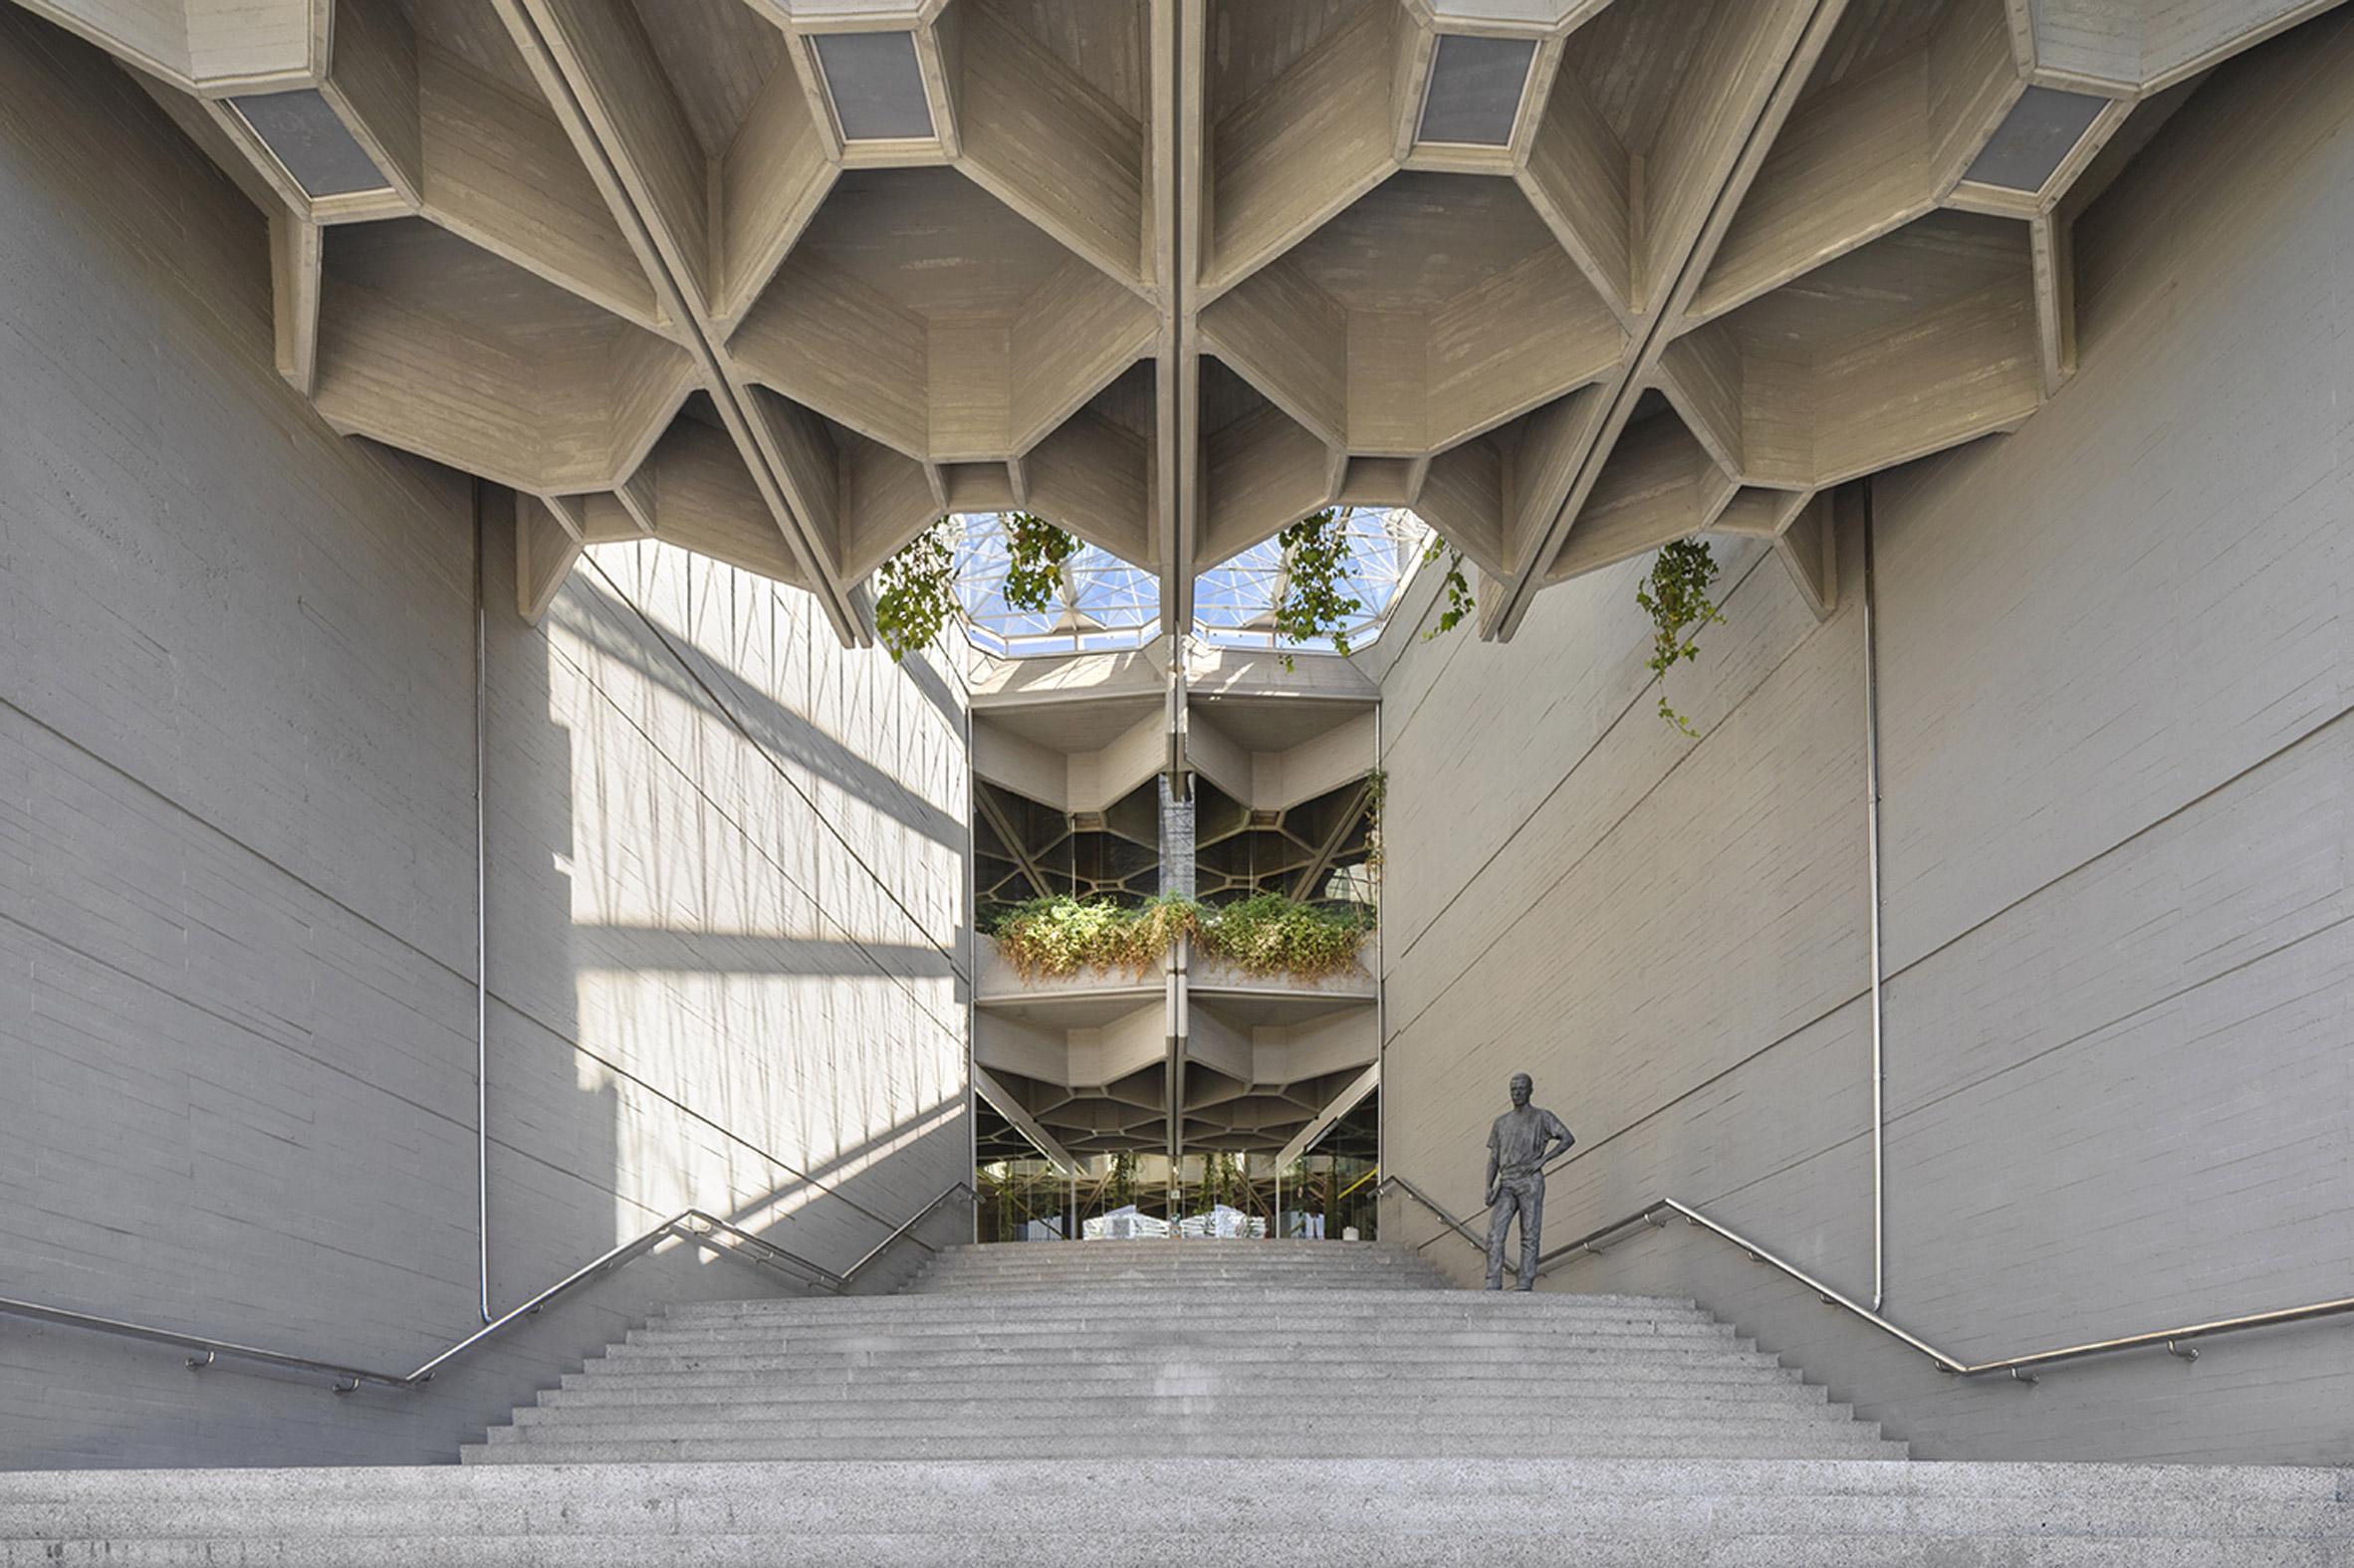 Interior of Instituto del Patrimonio Cultural de España in Madrid